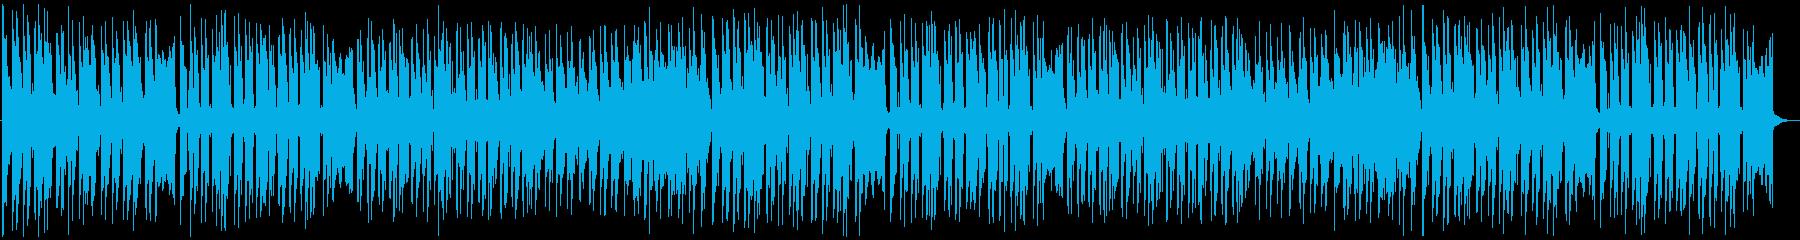 Kawaii FutureBass 01's reproduced waveform